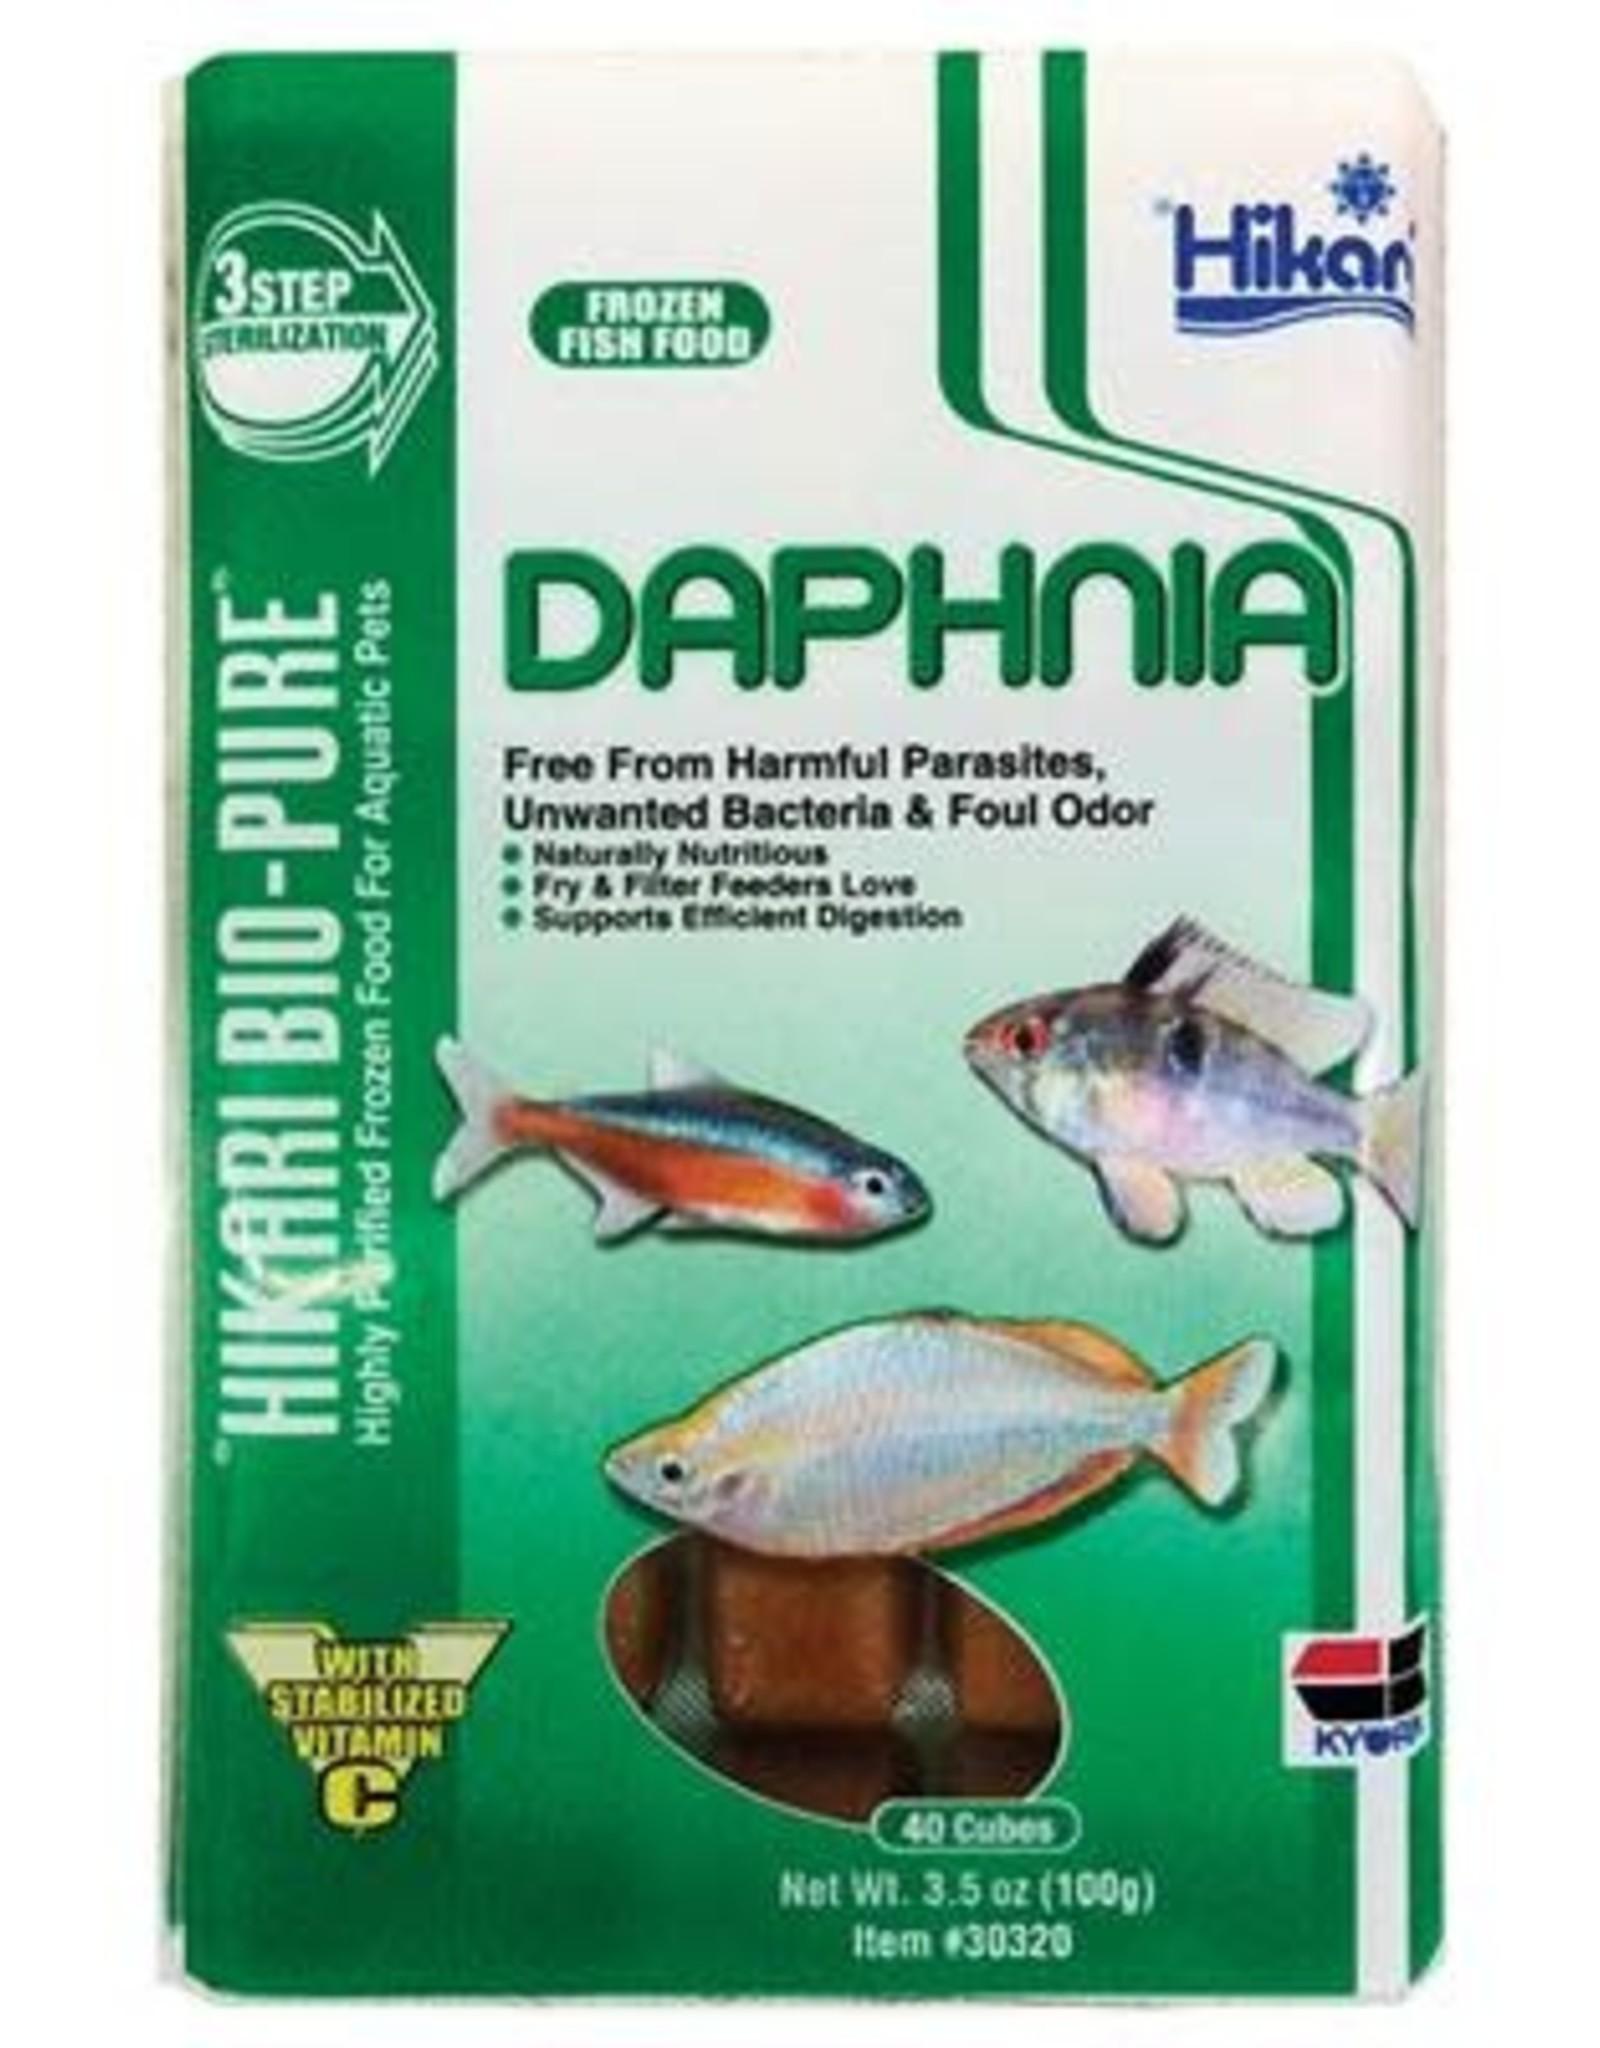 HIKARI USA INC. Frozen - Daphnia 3.5OZ Cube